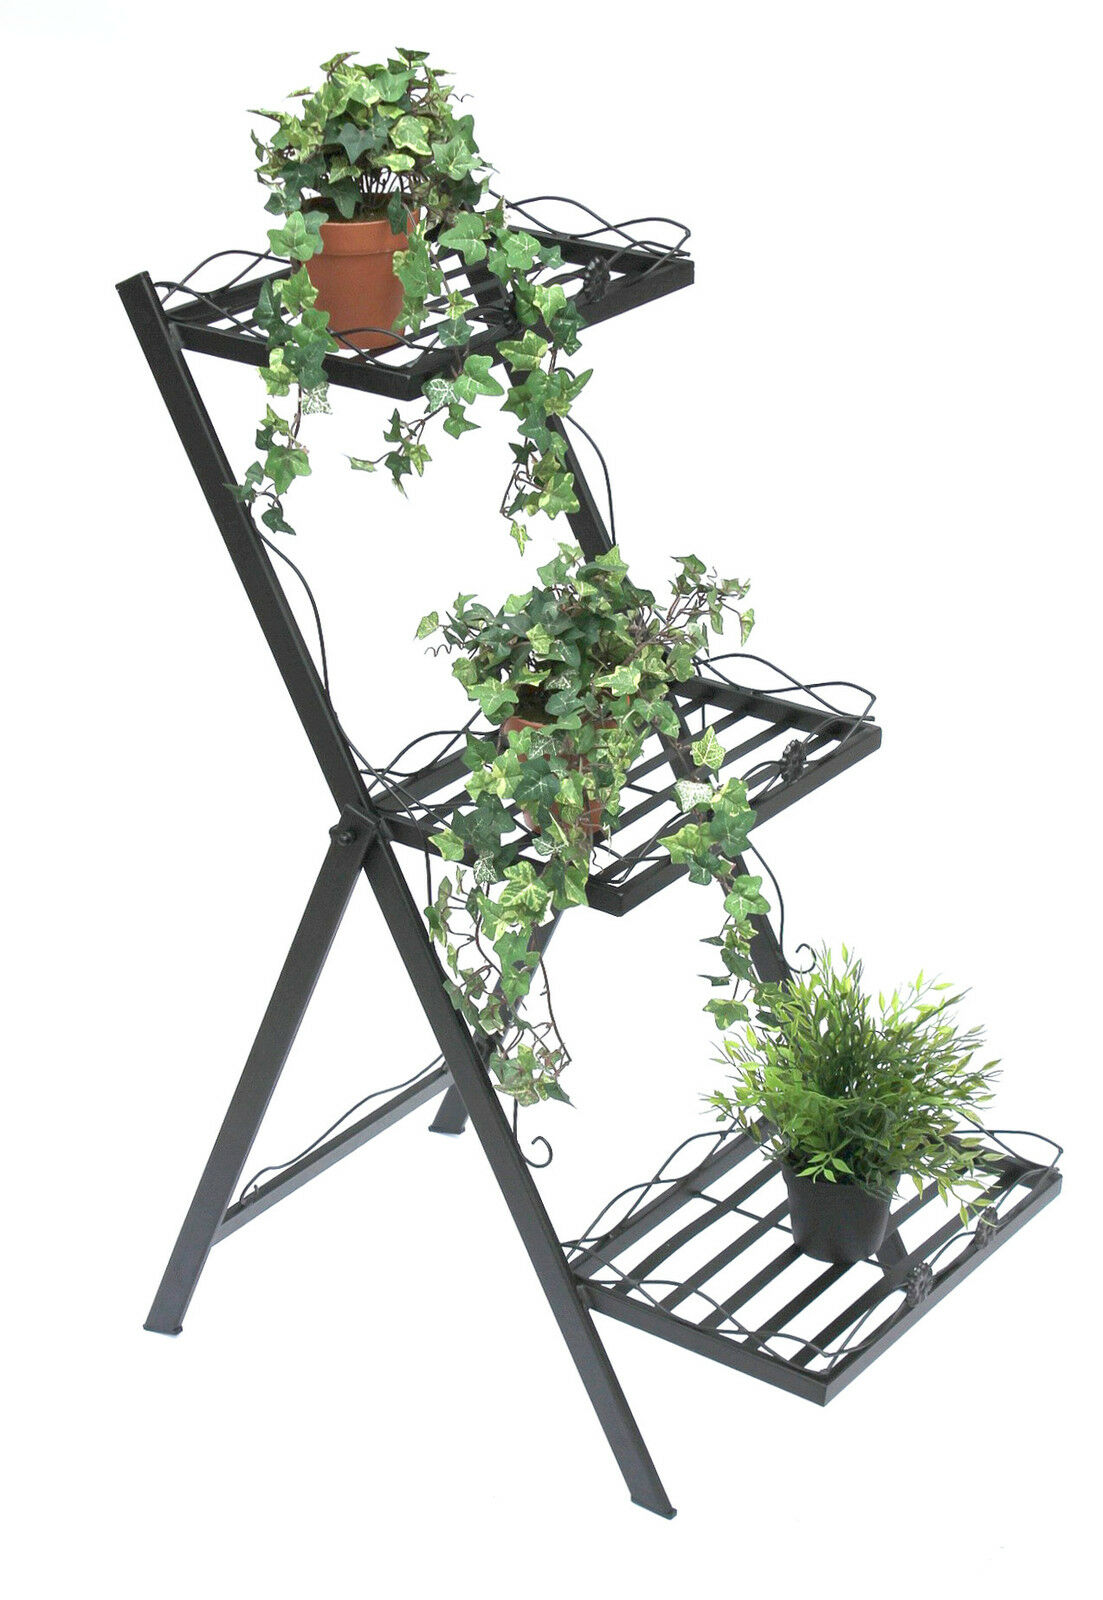 scala Fiori Fiorina in metallo 94 cm spezie per piante fioriera